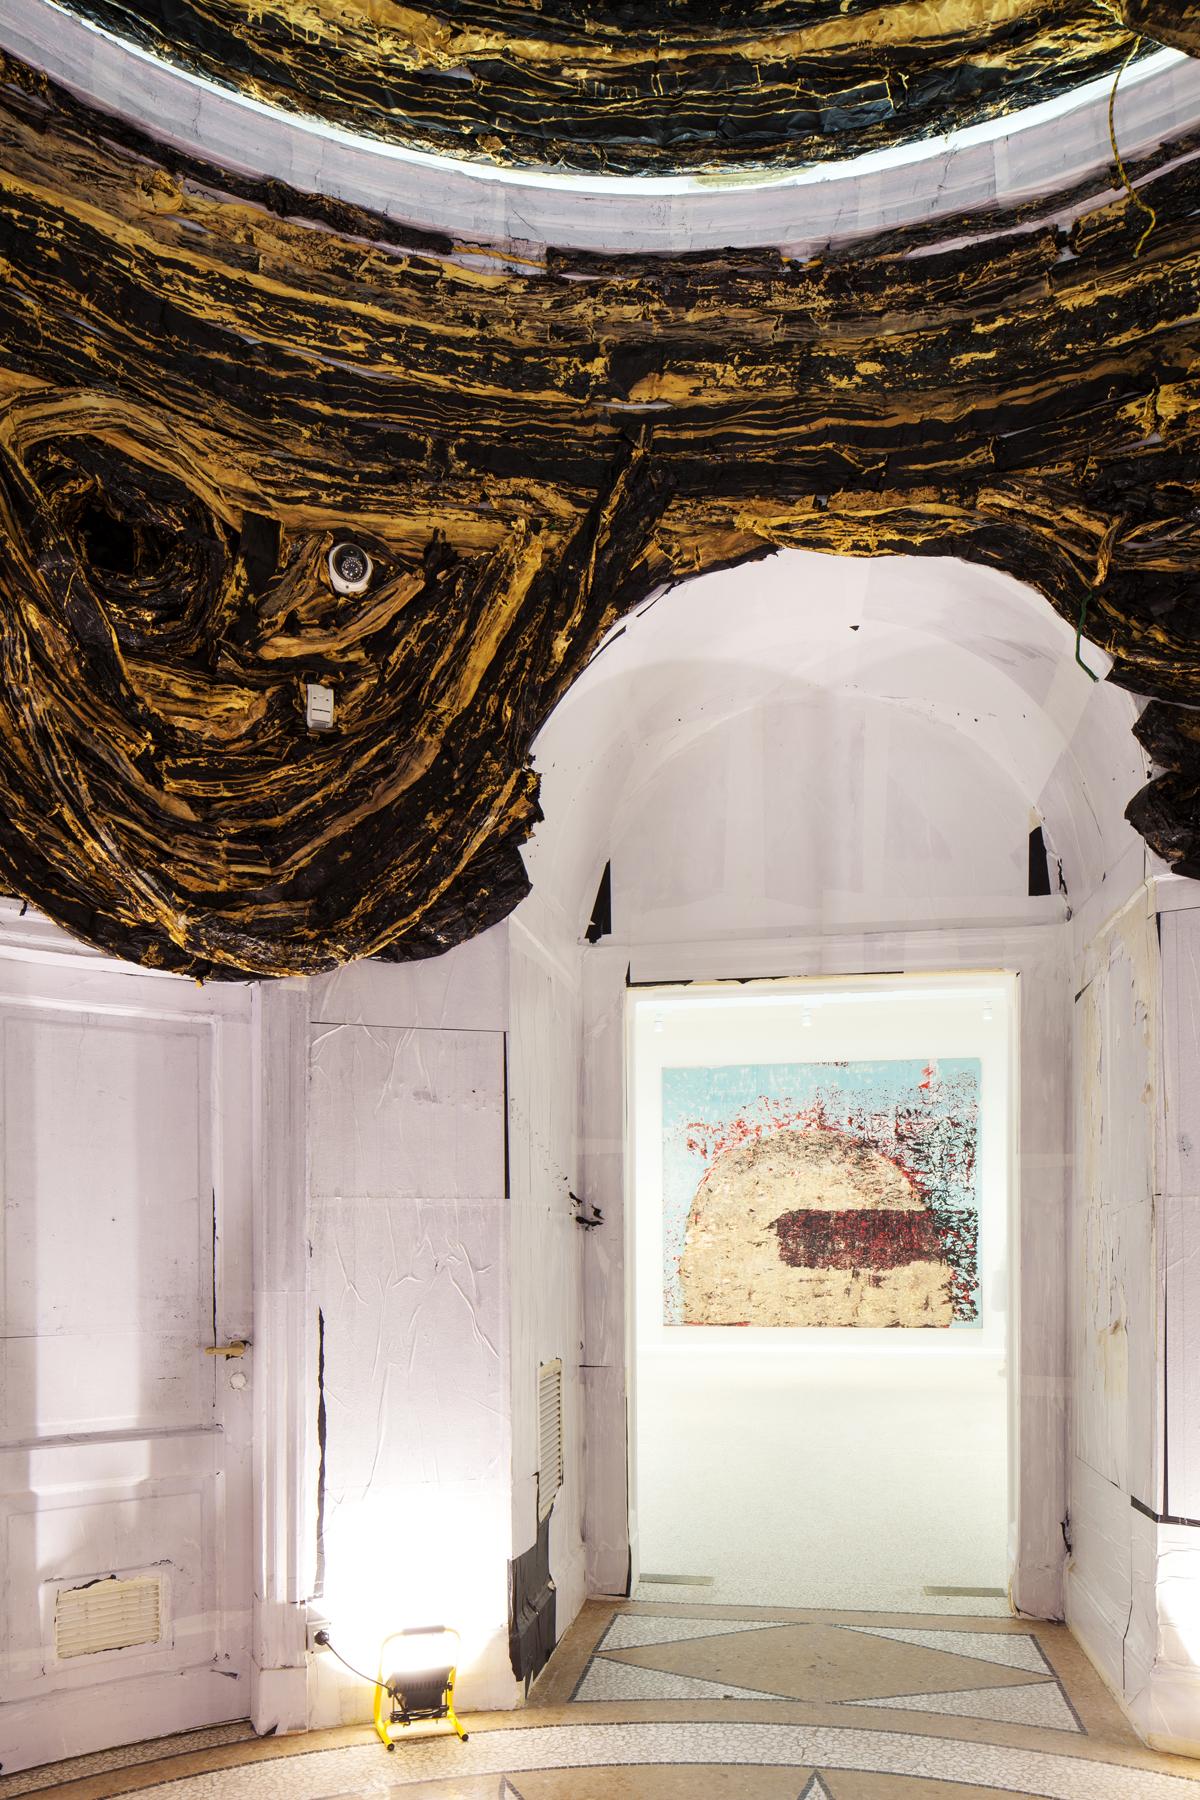 Biennale-Venezia-Francesco-Galli-stati-uniti